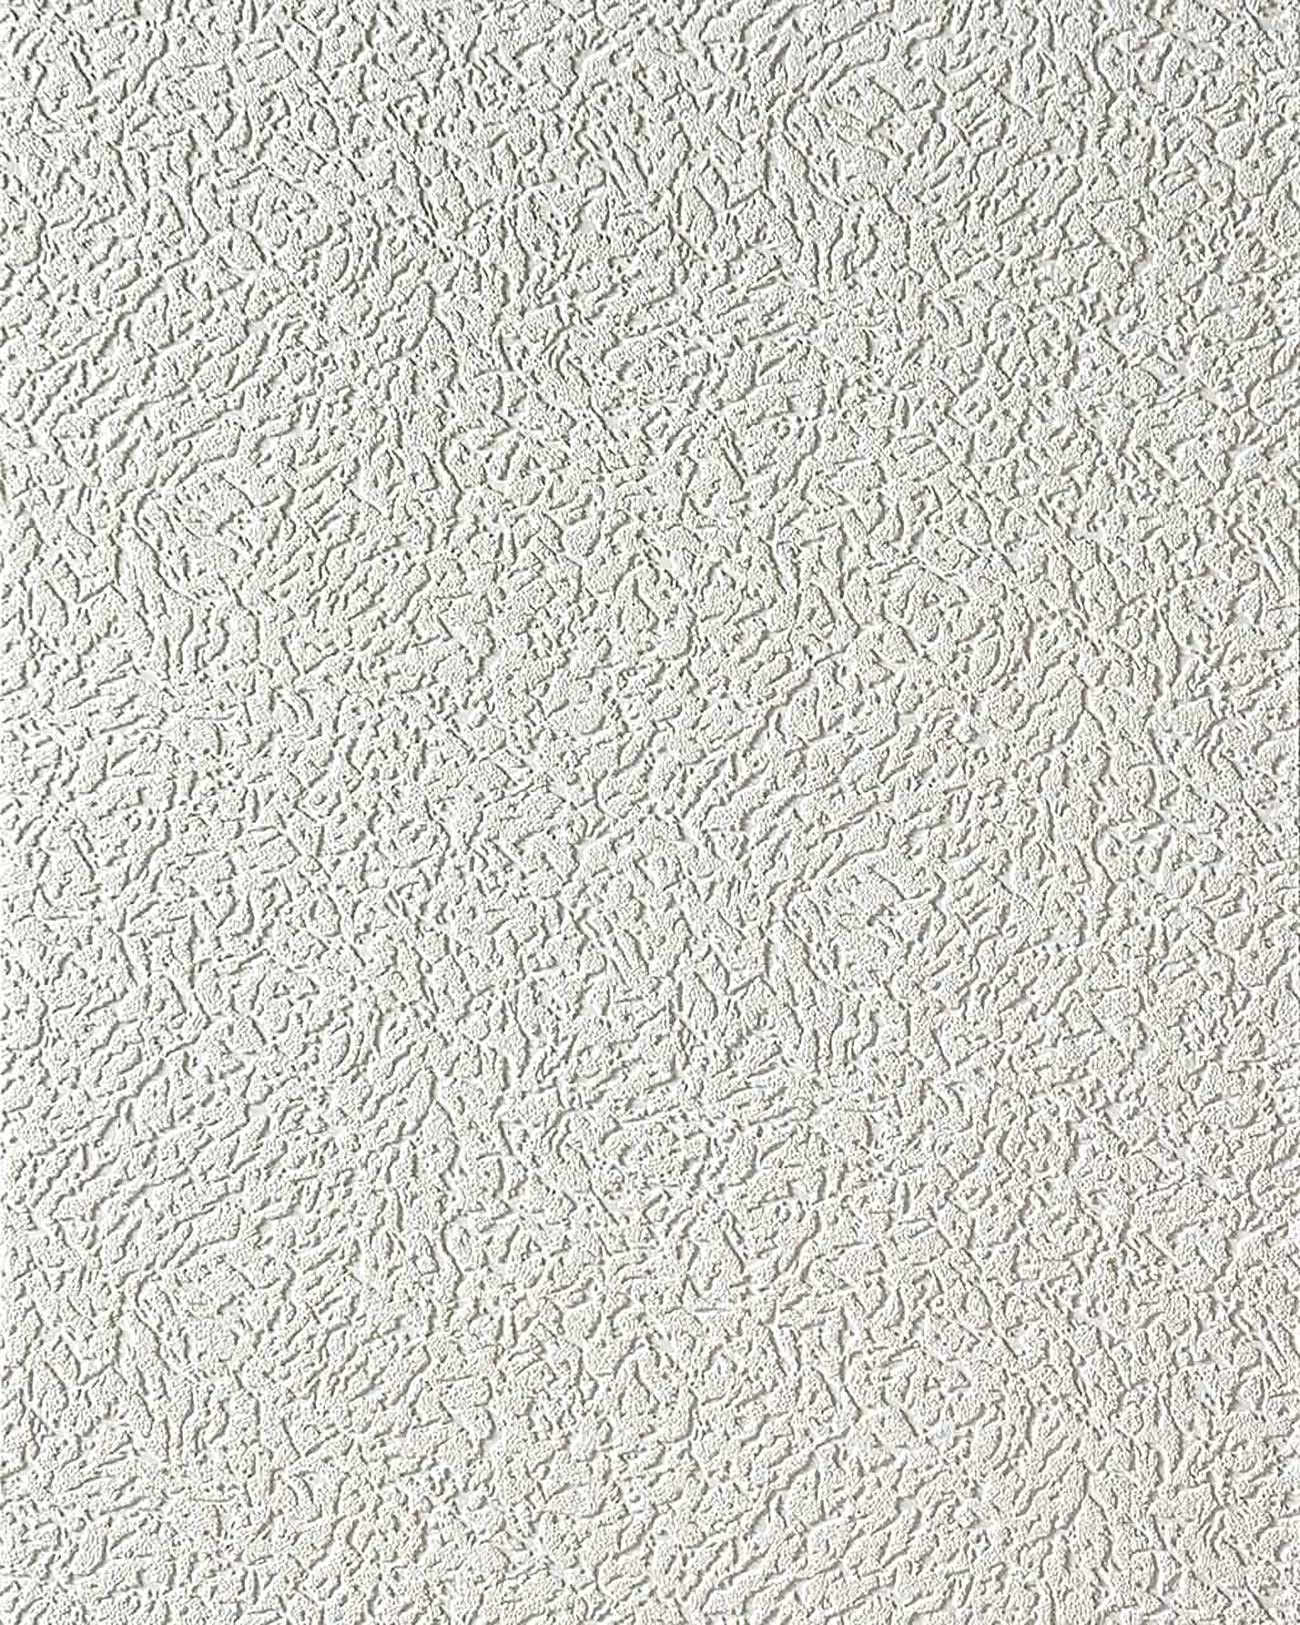 tapete 202 40 edem original edem schnee wei dekorative struktur grobe putz rauhfaser optik. Black Bedroom Furniture Sets. Home Design Ideas